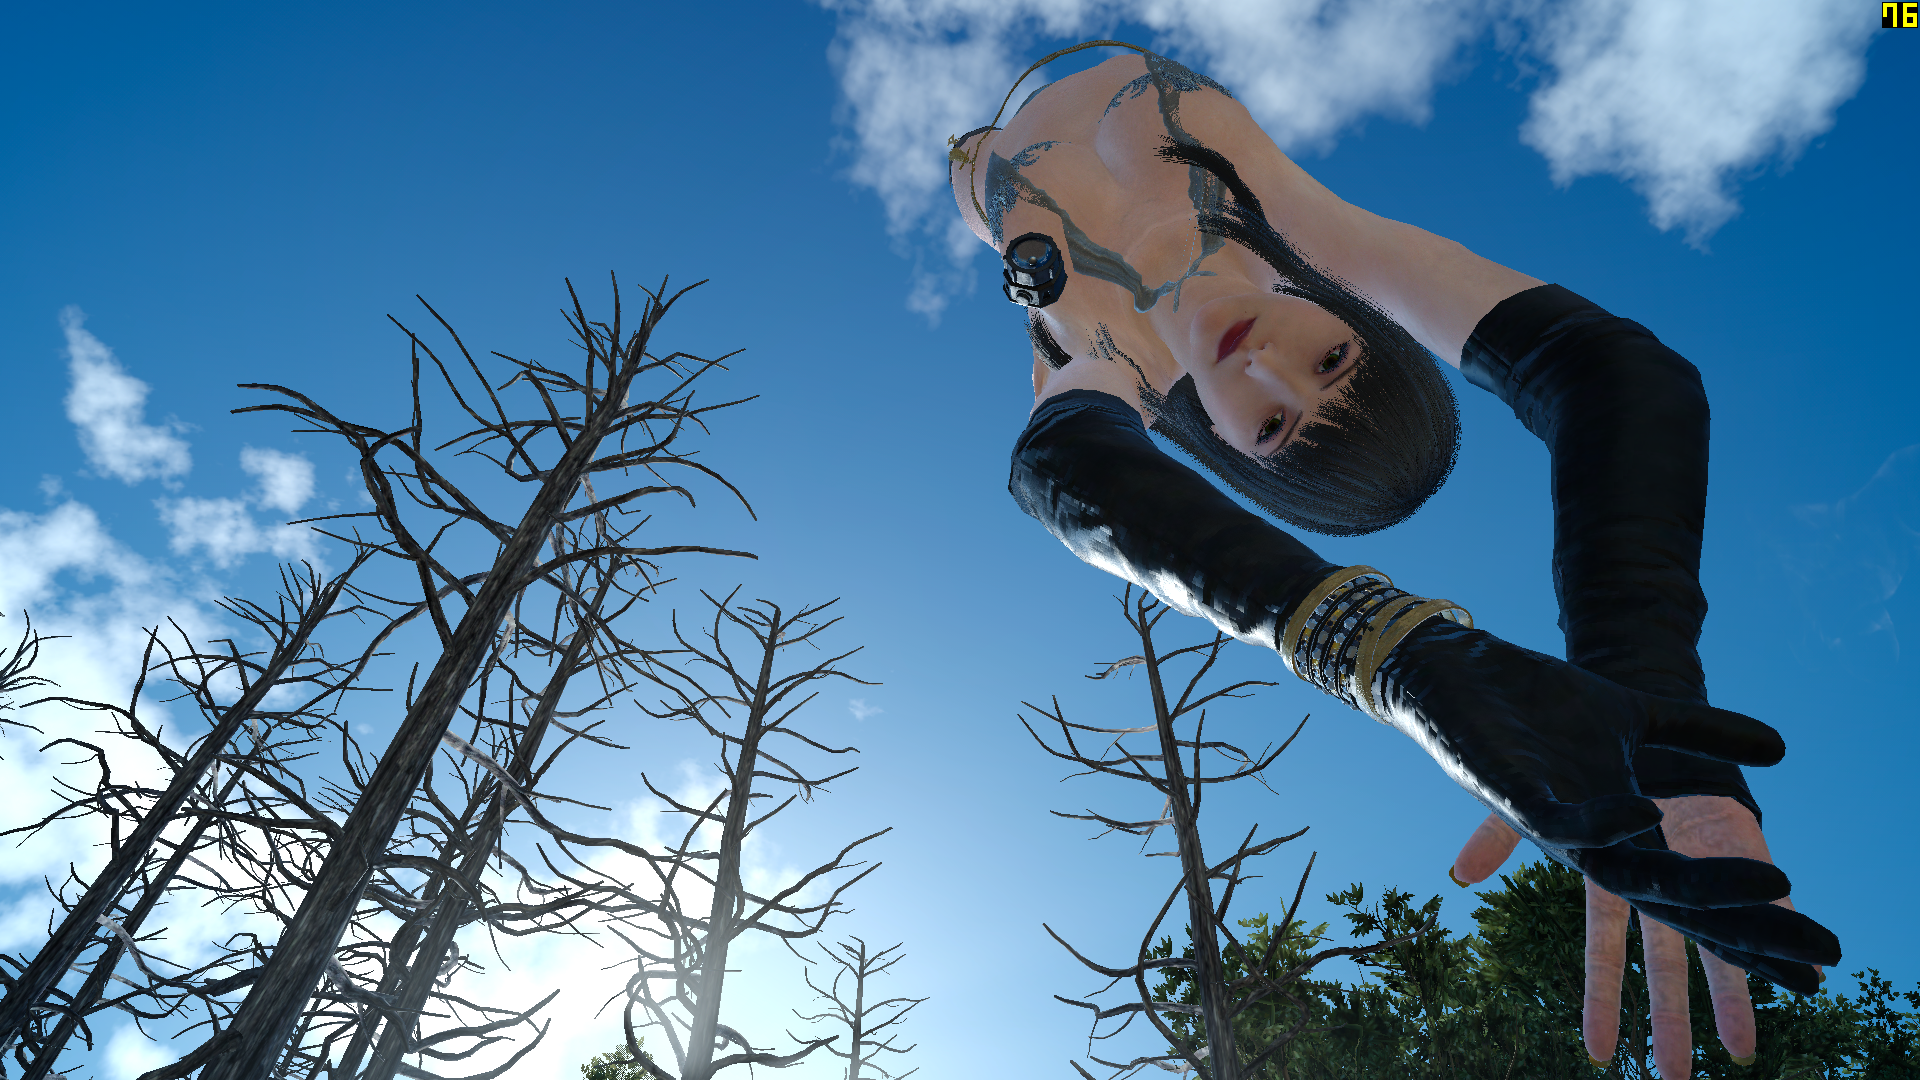 Final Fantasy XV Windows Edition Screenshot 2019.04.26 - 19.02.34.46.png